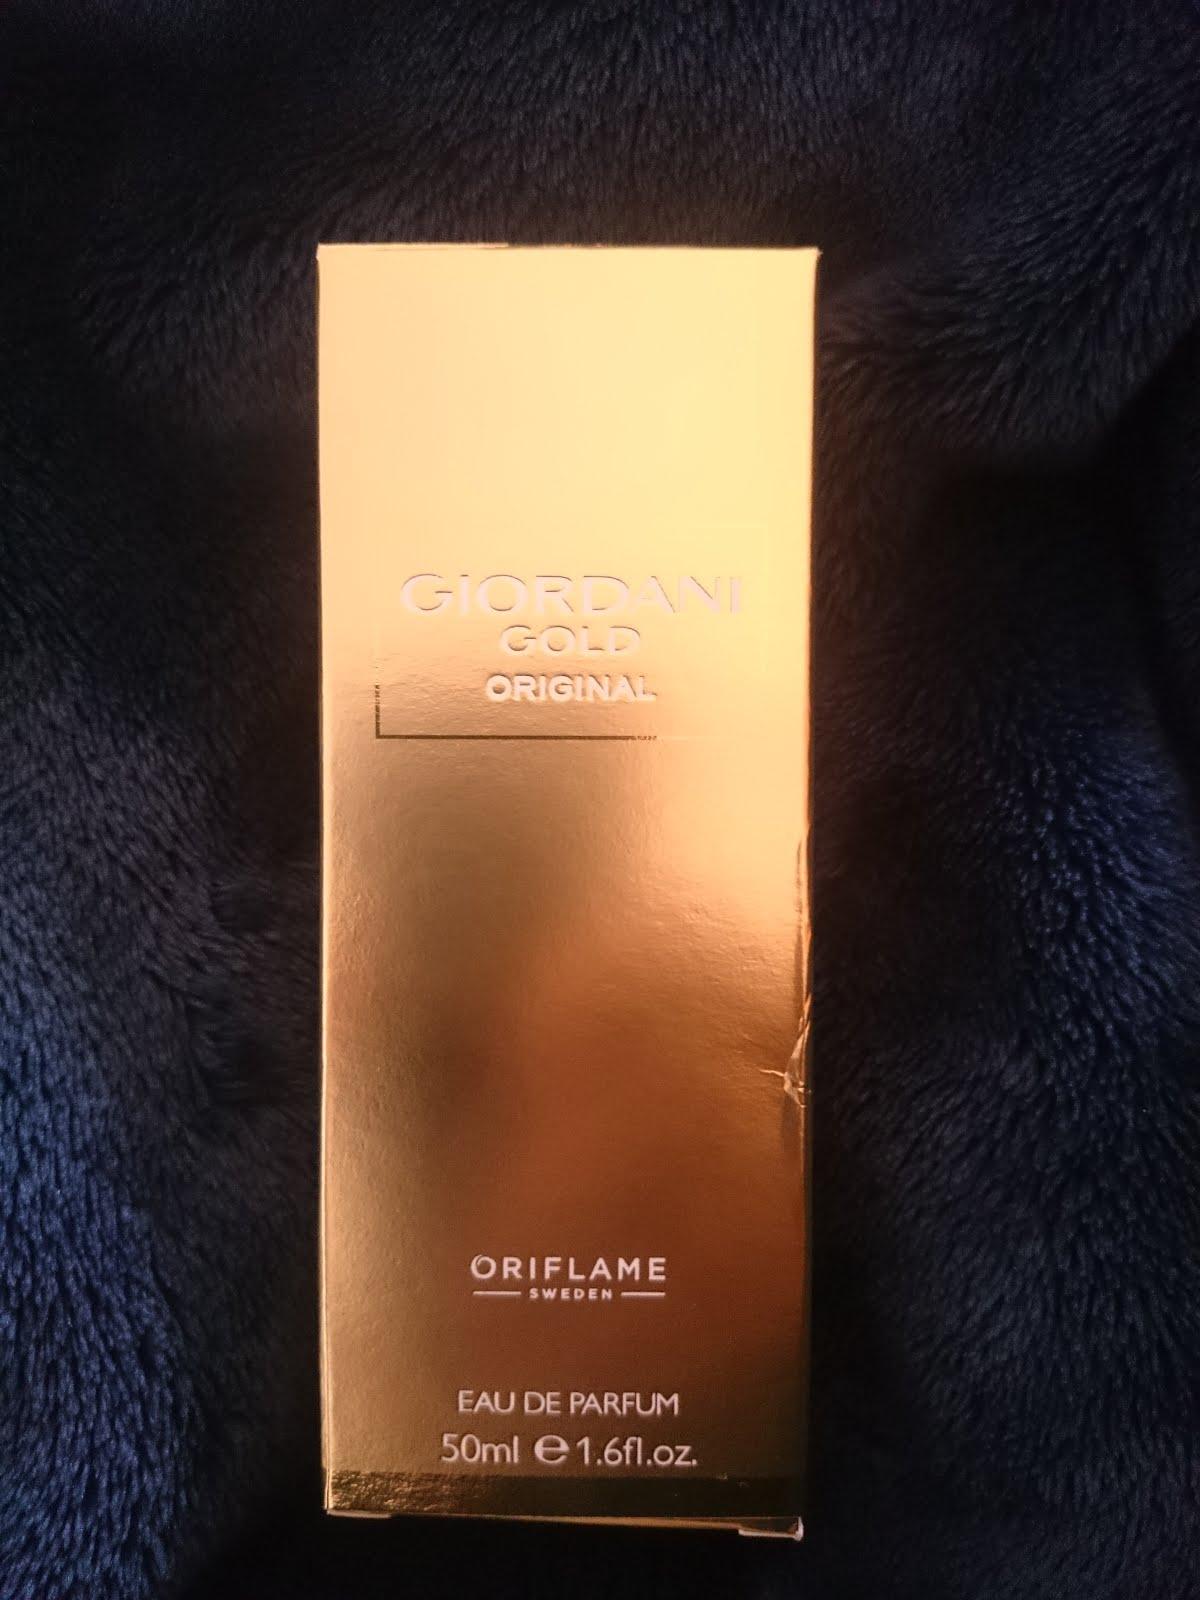 Makeup Life And Style Review Oriflame Giordani Gold Original Parfume